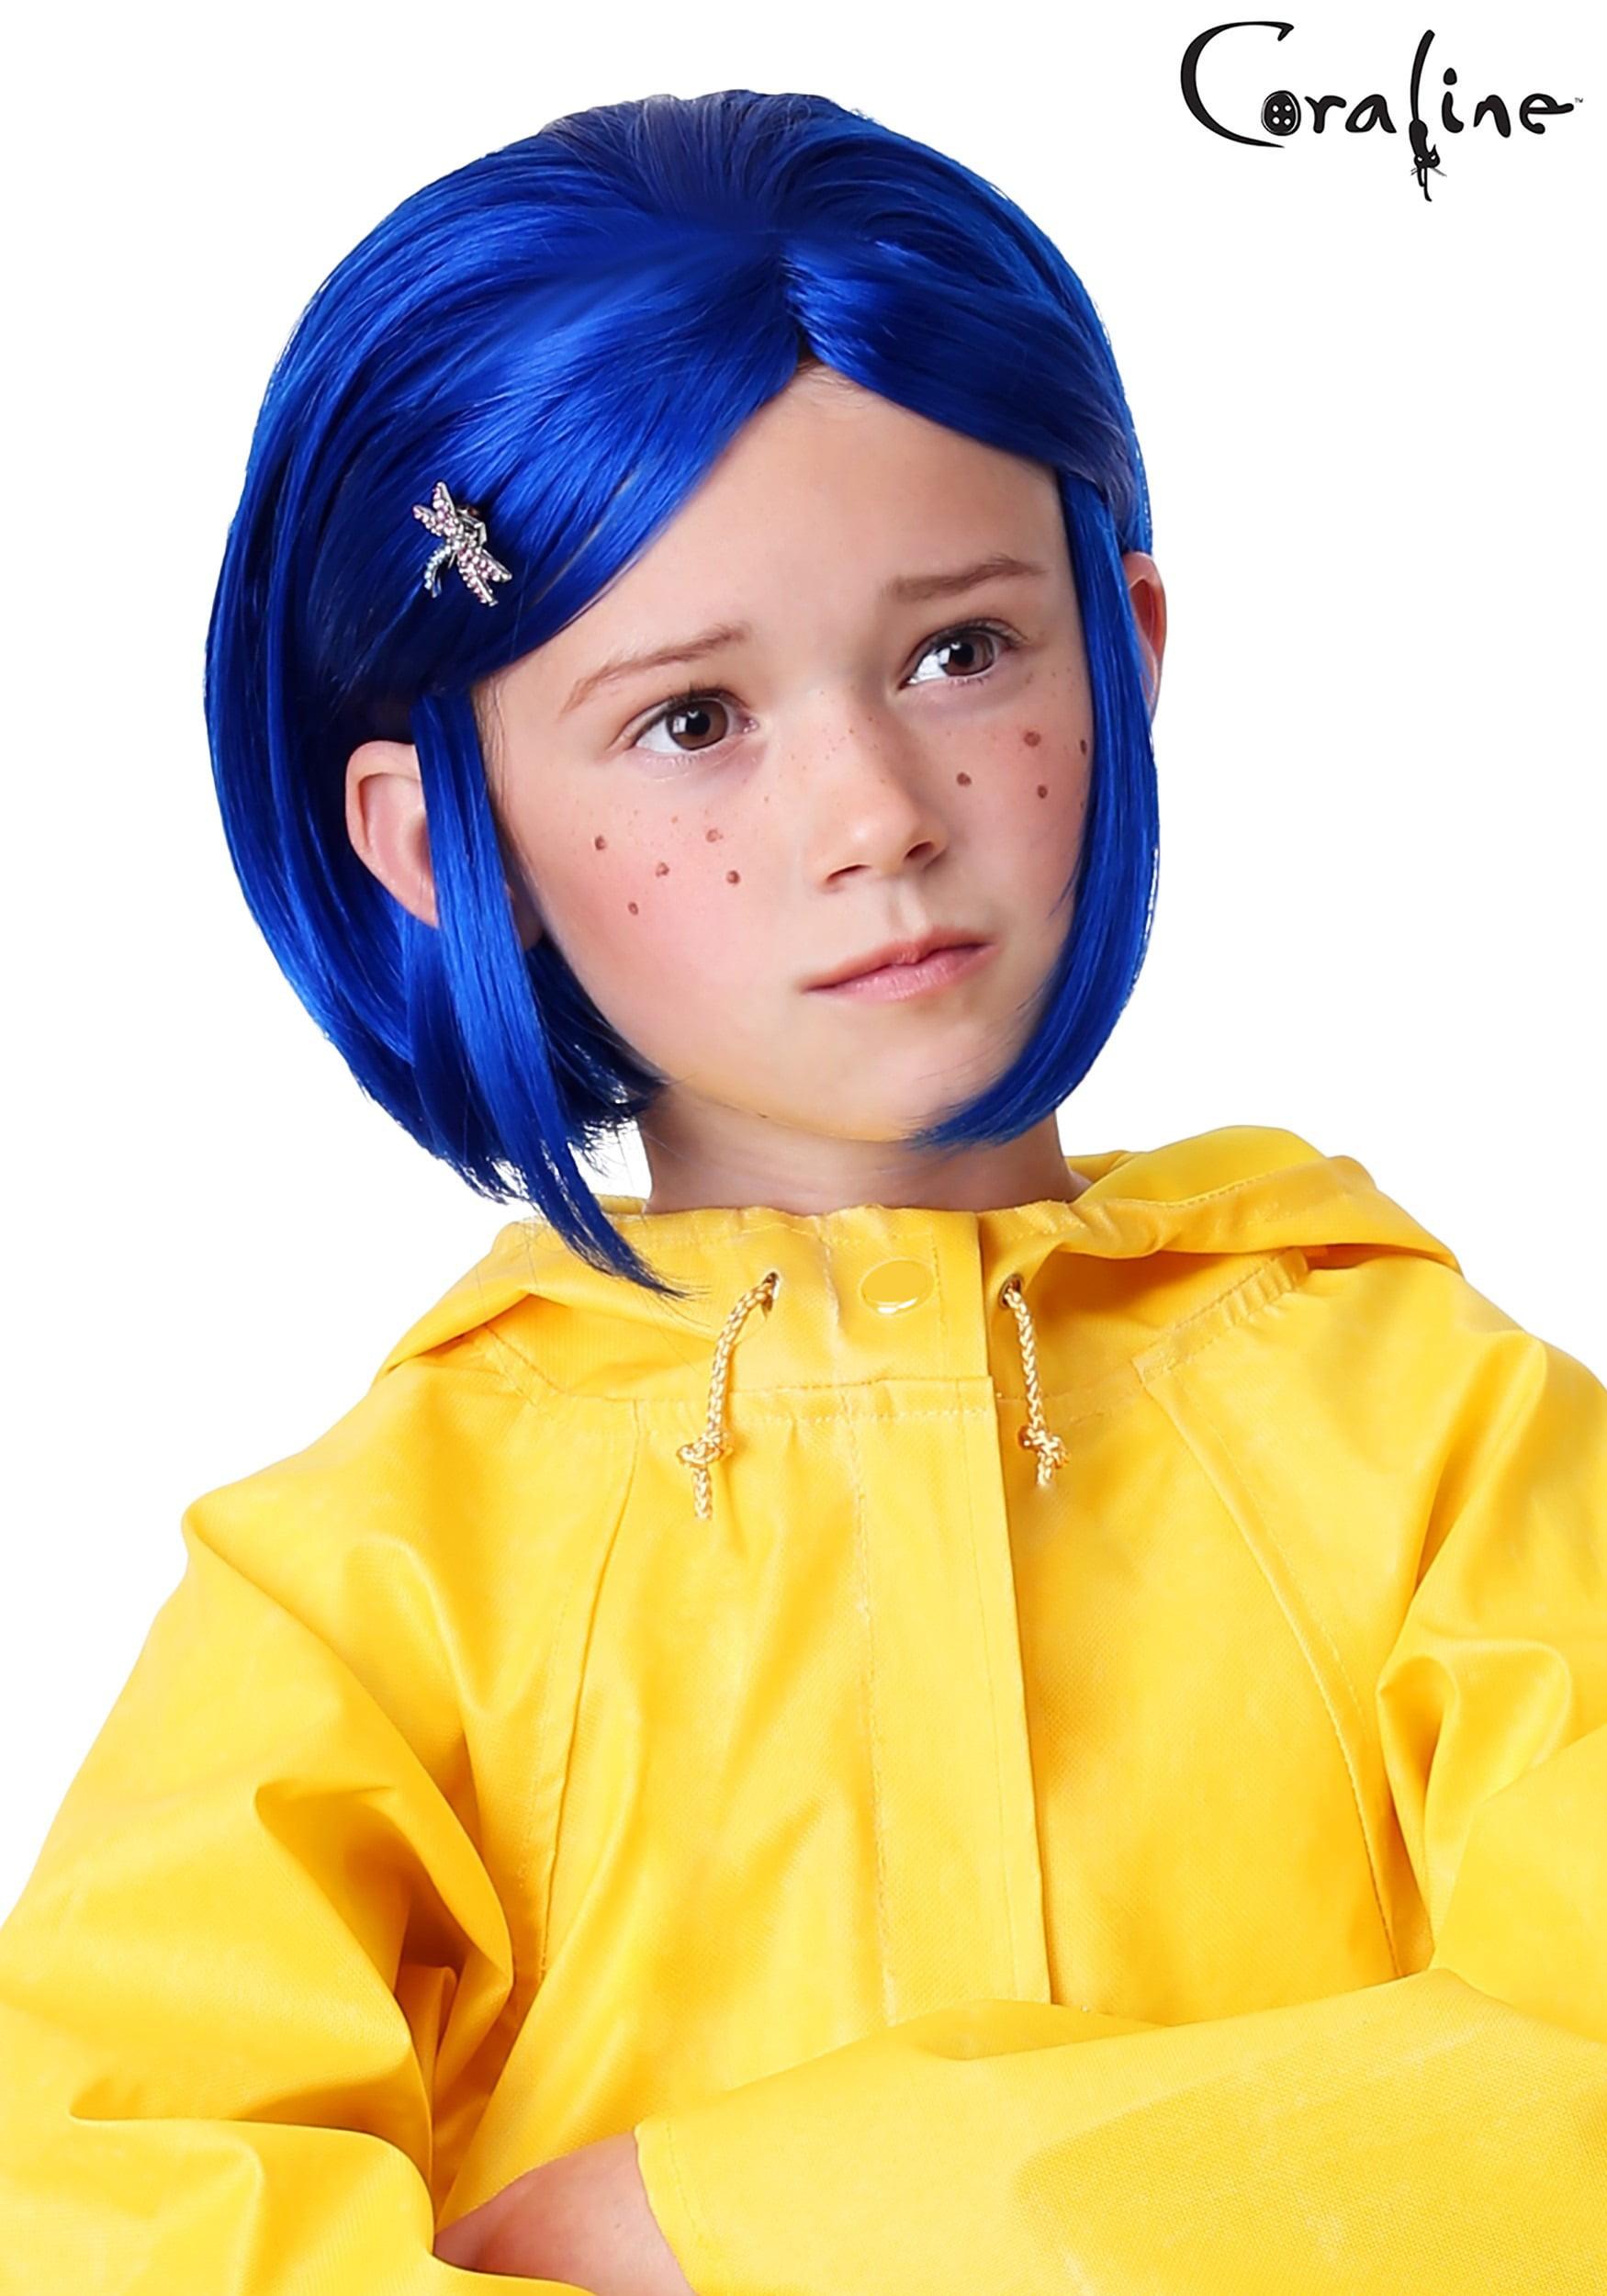 Child Coraline Wig Walmart Com Walmart Com